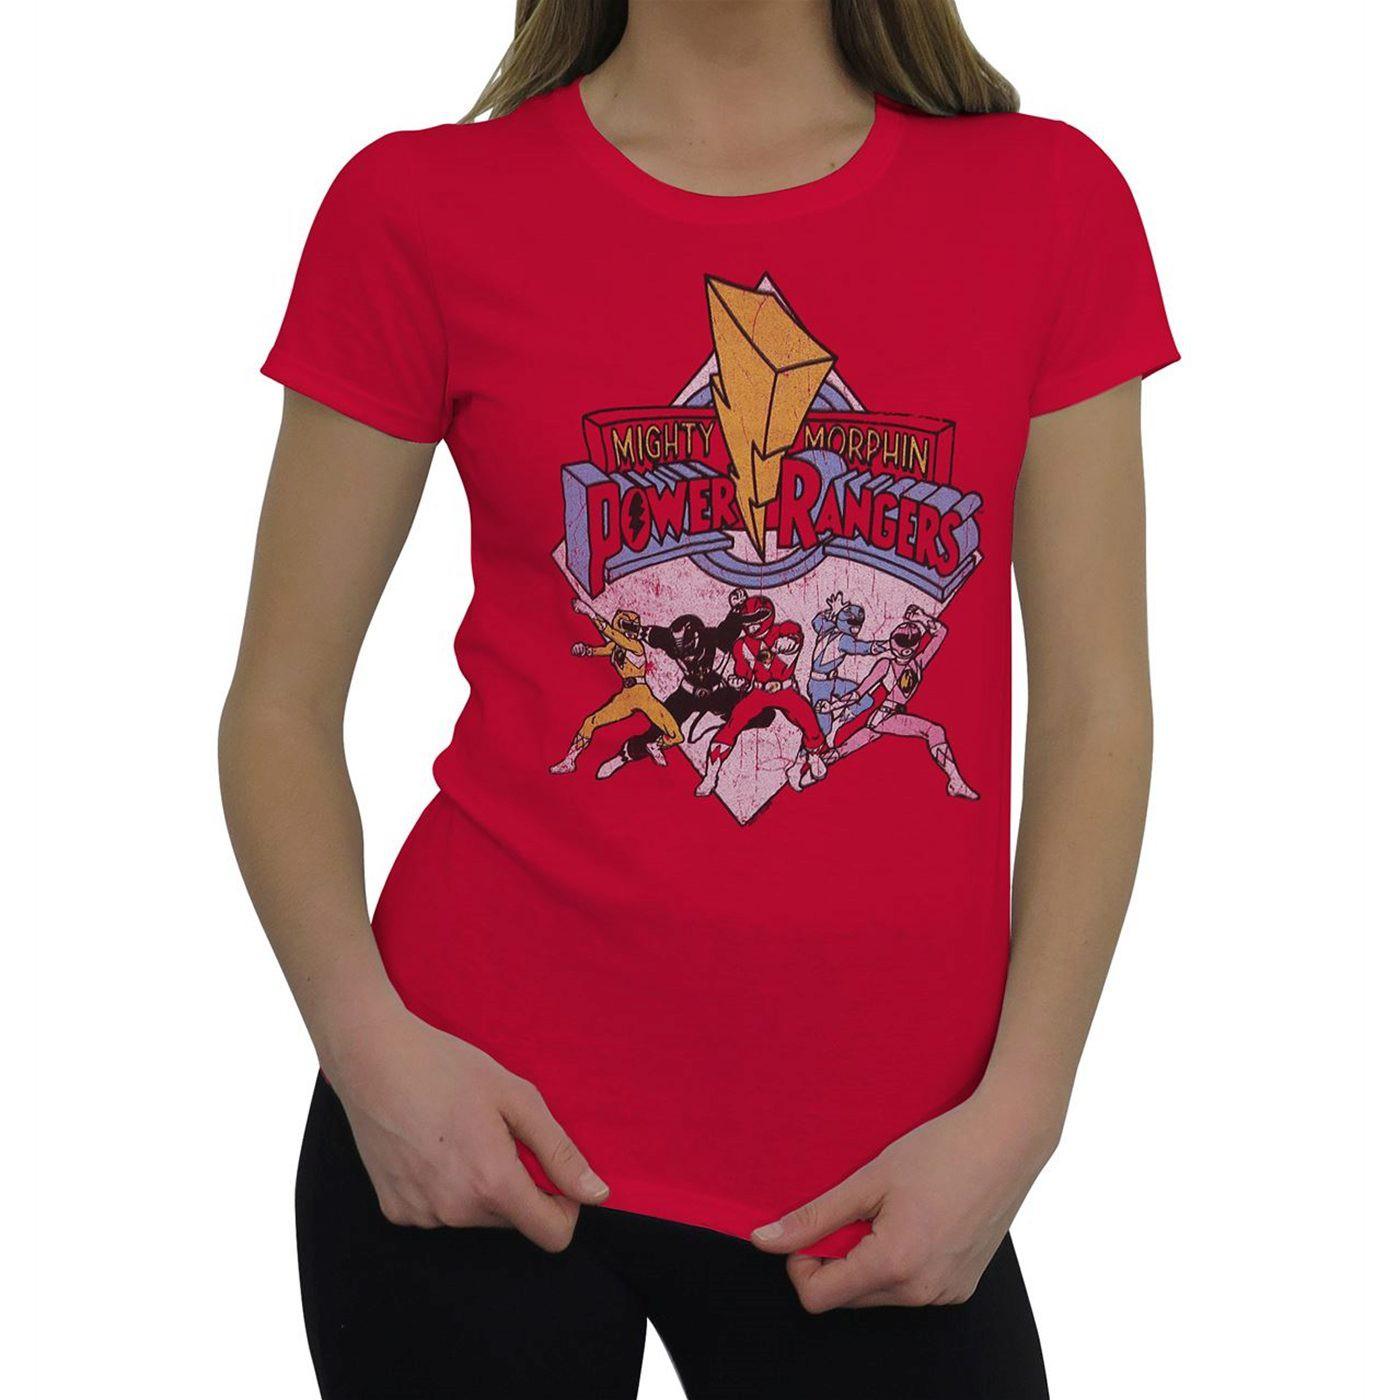 Power Rangers Retro Rangers Women's T-Shirt